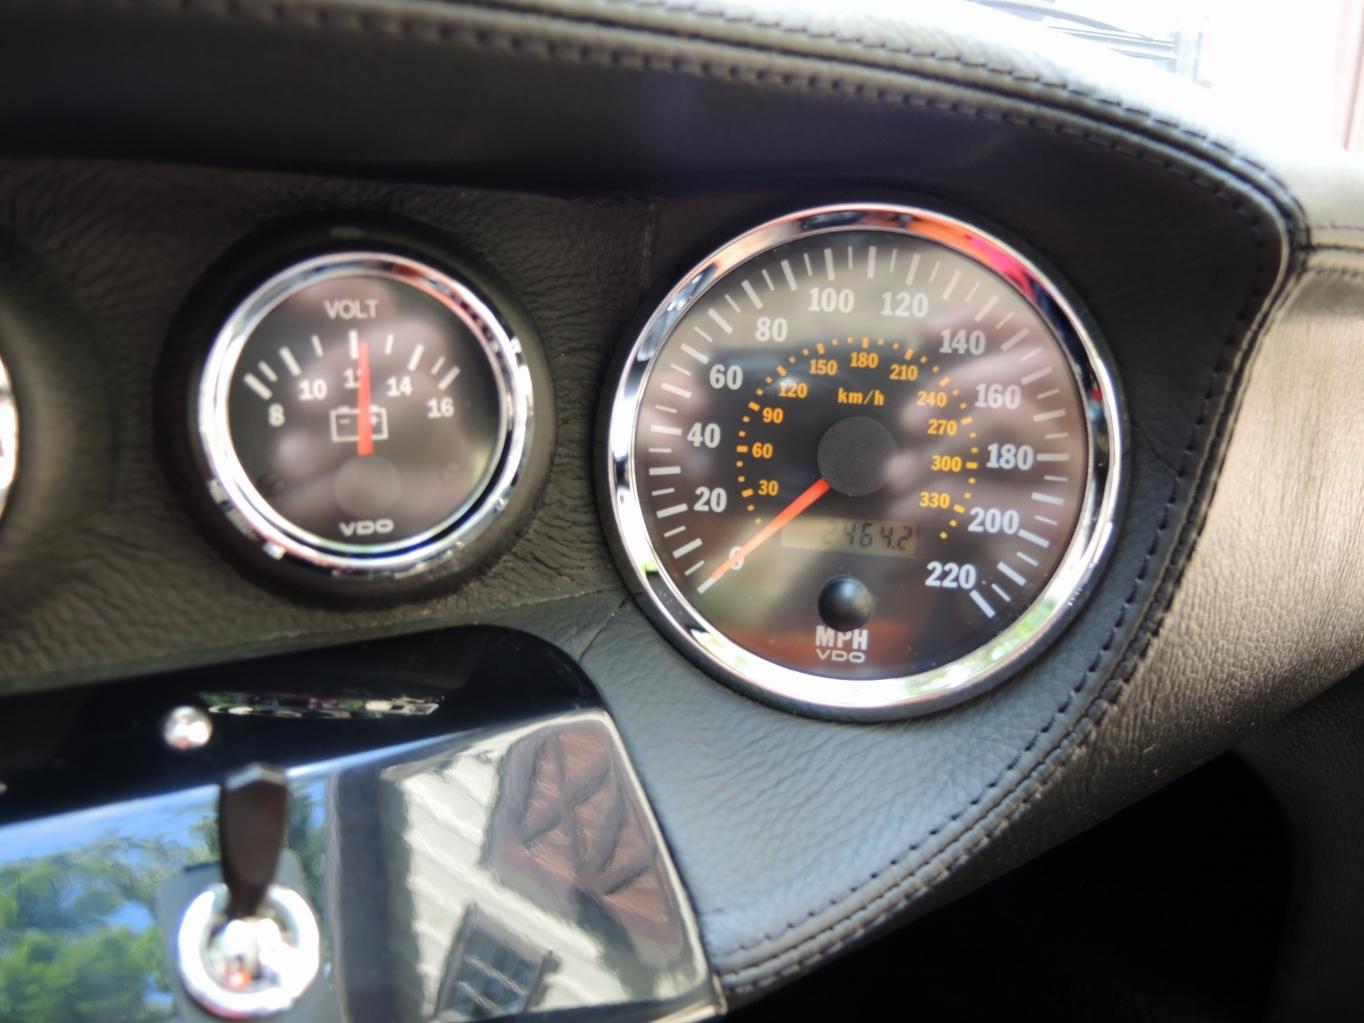 1966 CAV GT For Sale **SOLD**-interior-4-1920x1440-1364x1023-jpg